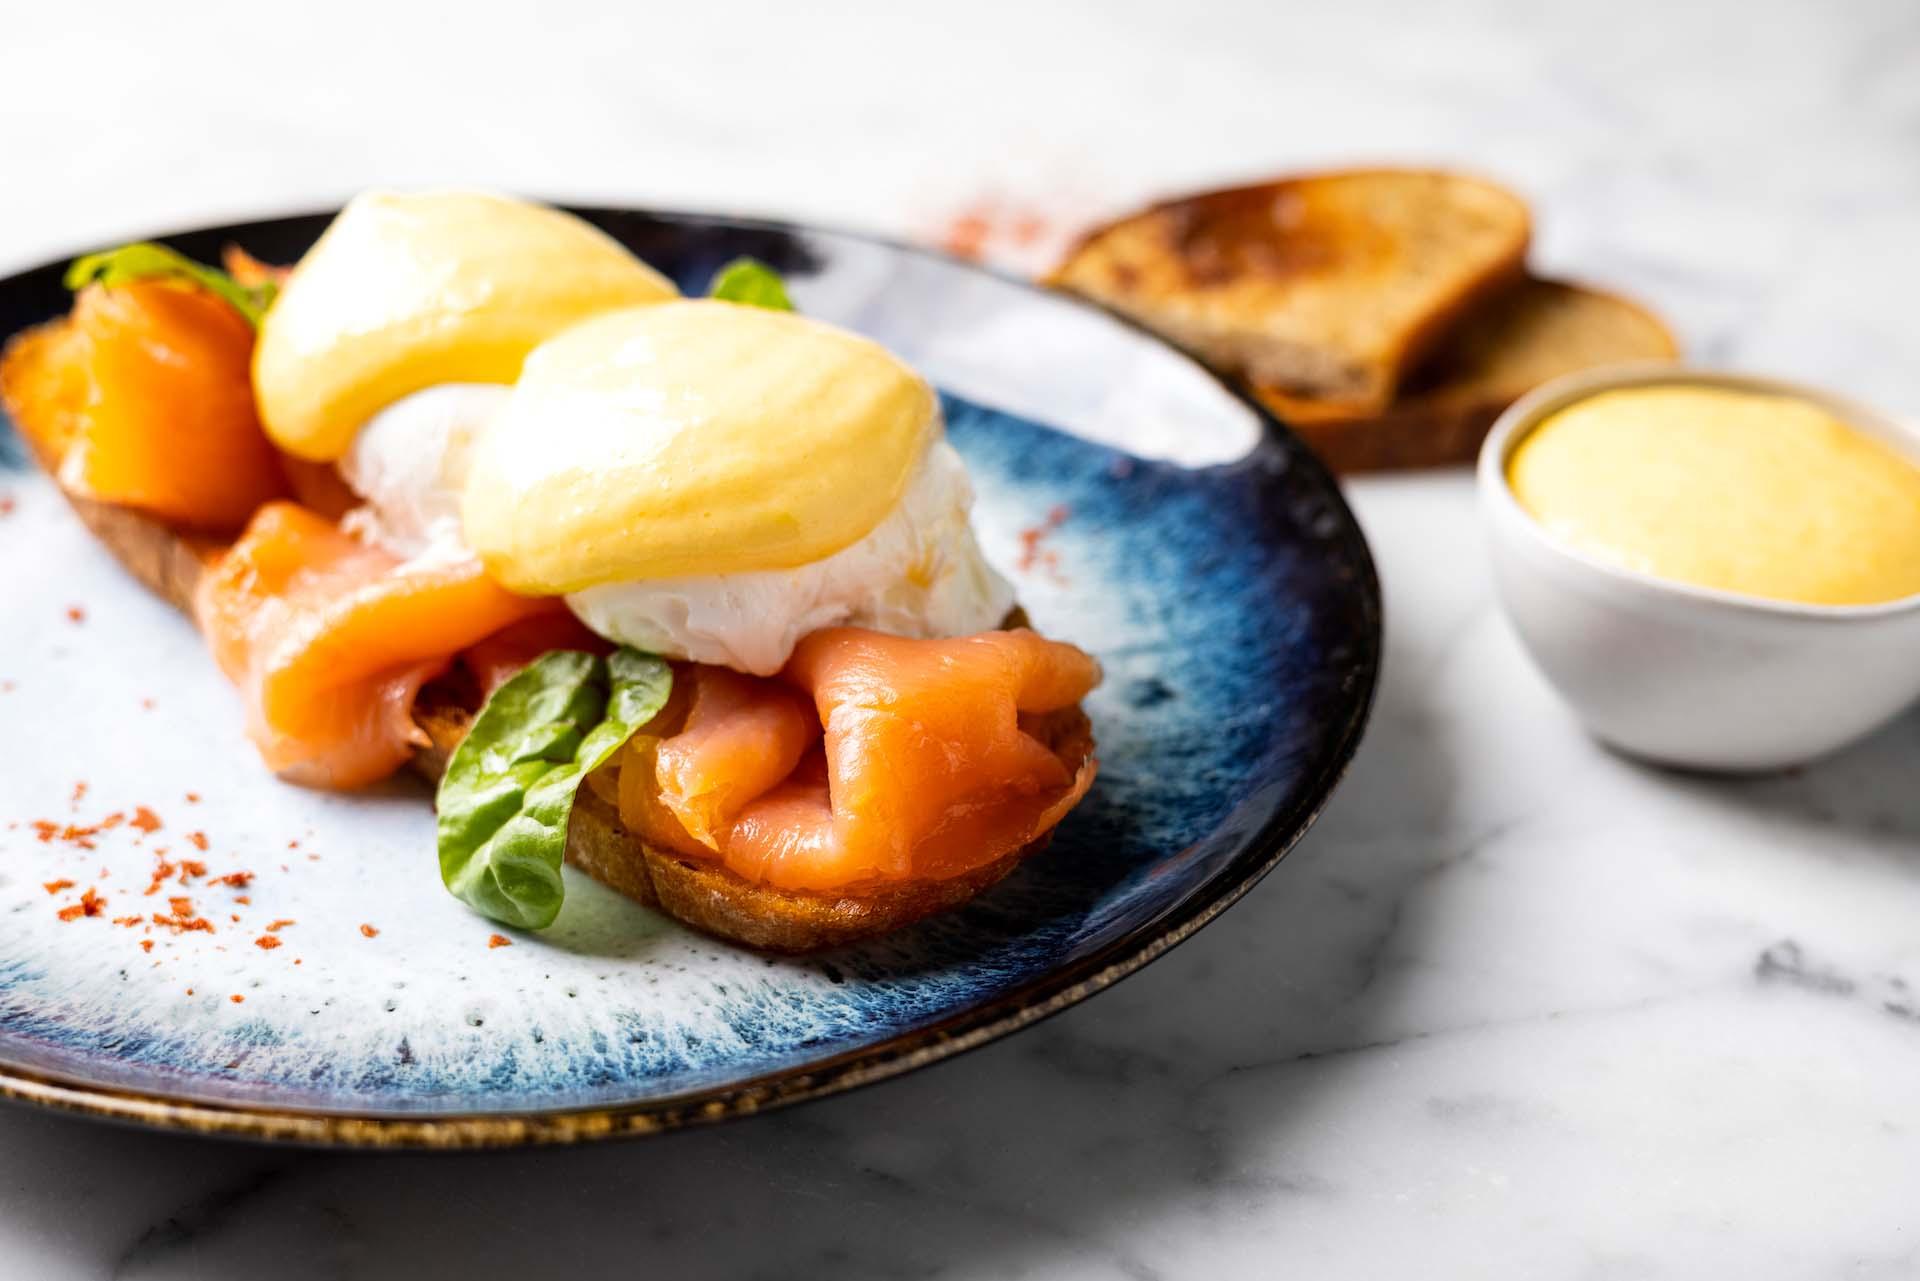 Chinaski_Tagesbar_Eggs Benedict Salmon Close up